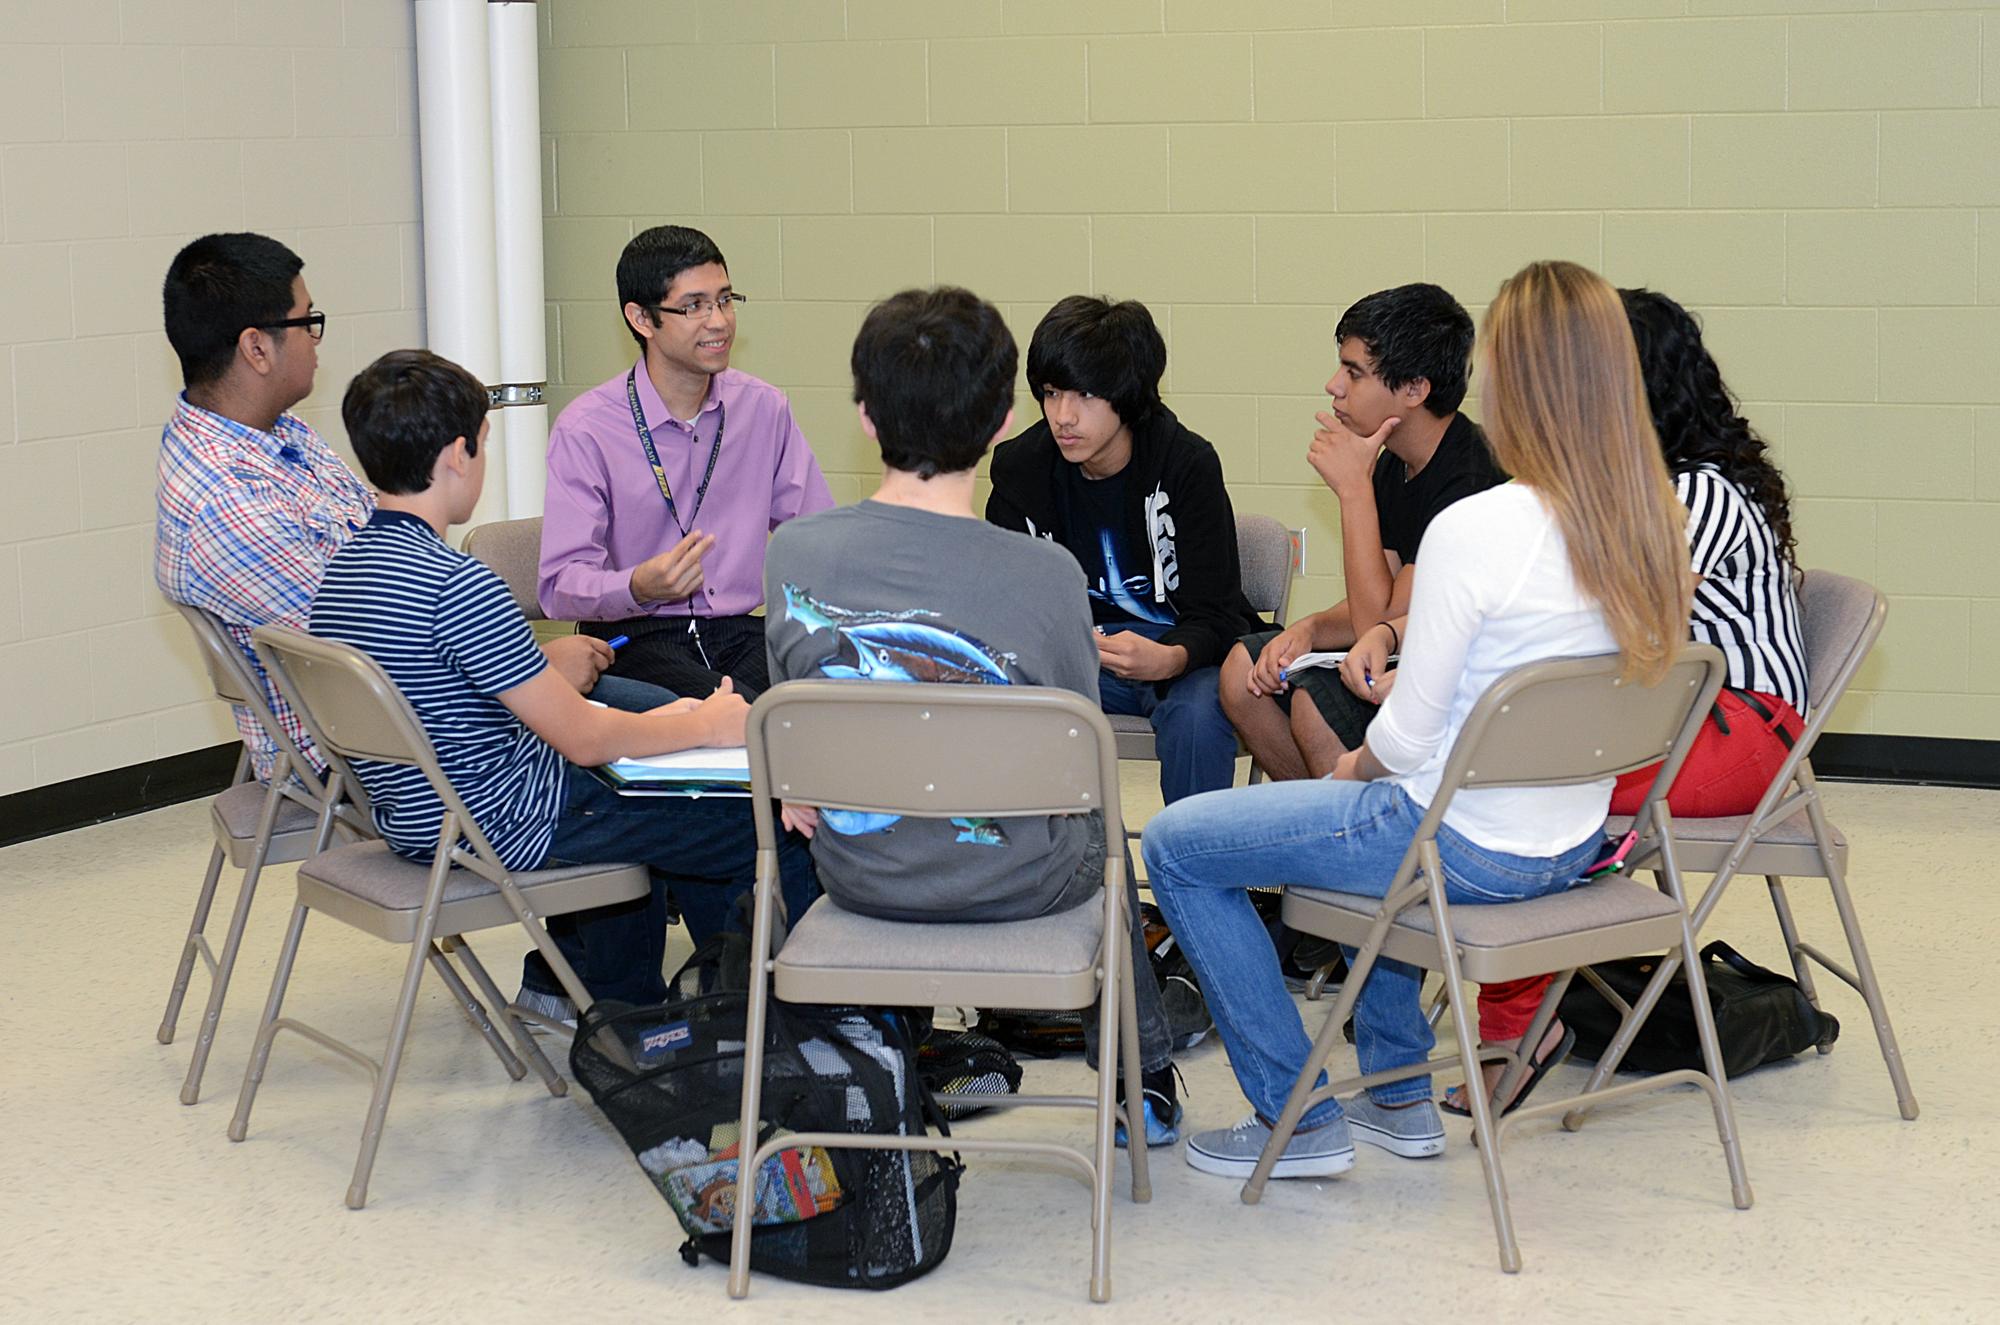 High schools speech programs partner to create district-wide achievement